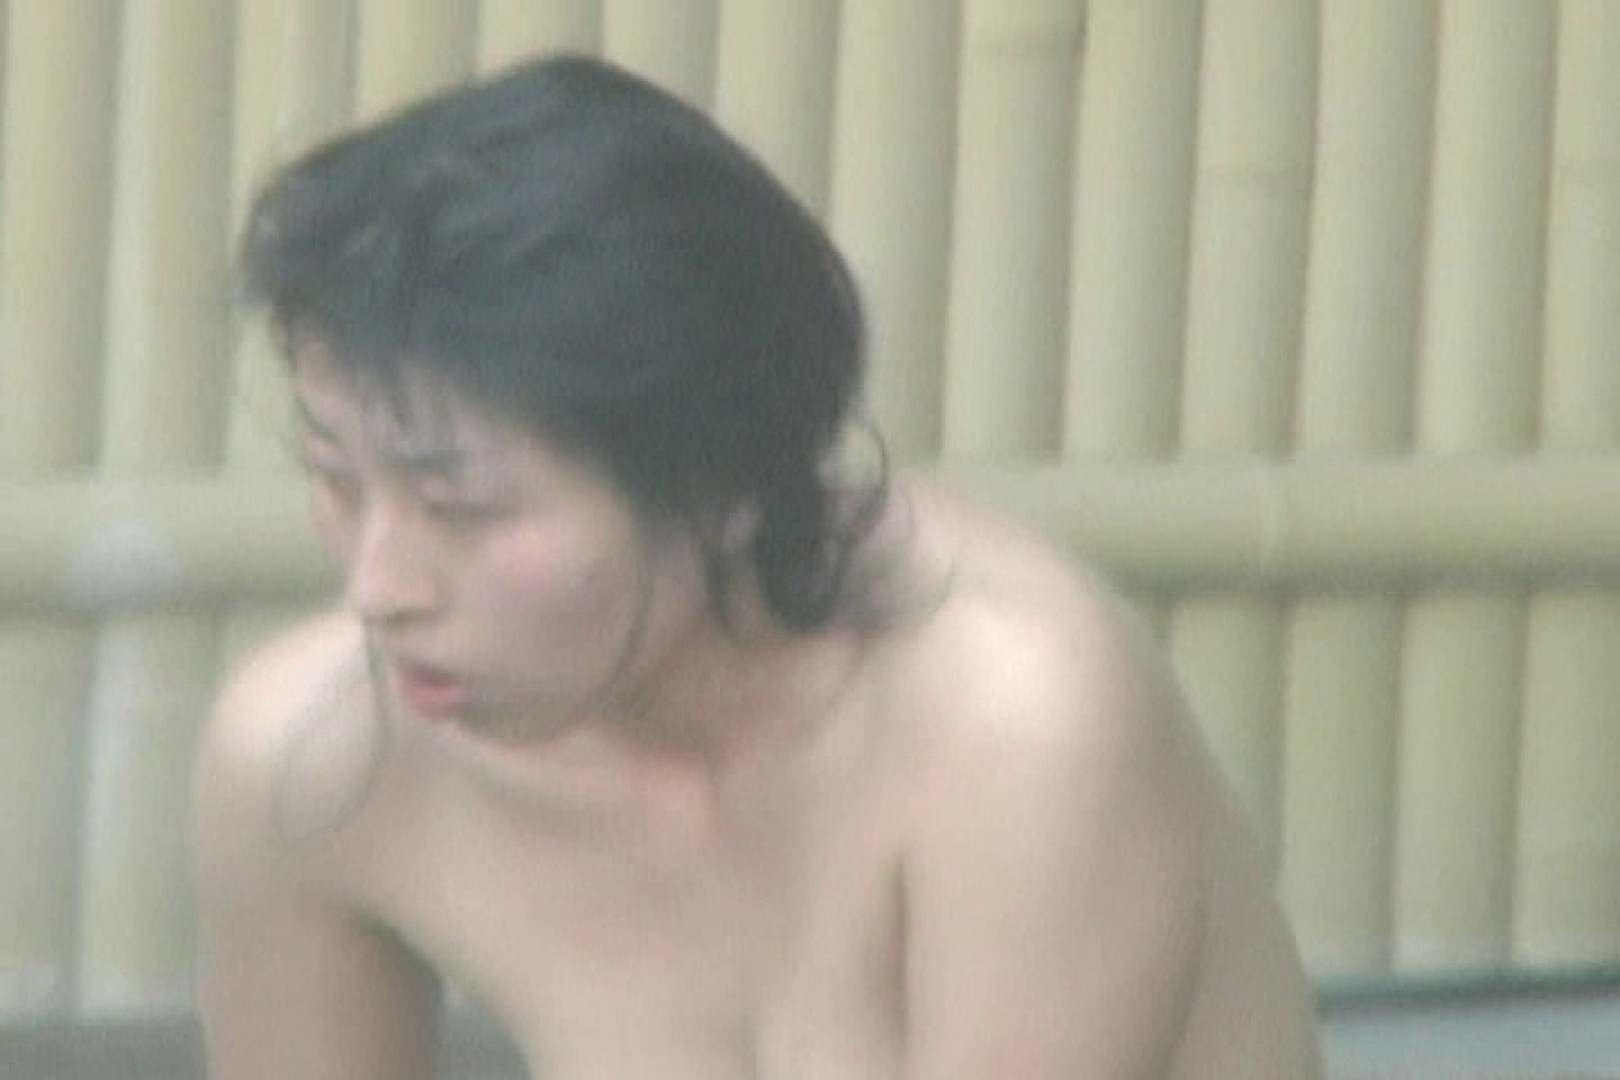 Aquaな露天風呂Vol.589 盗撮 | HなOL  105pic 71